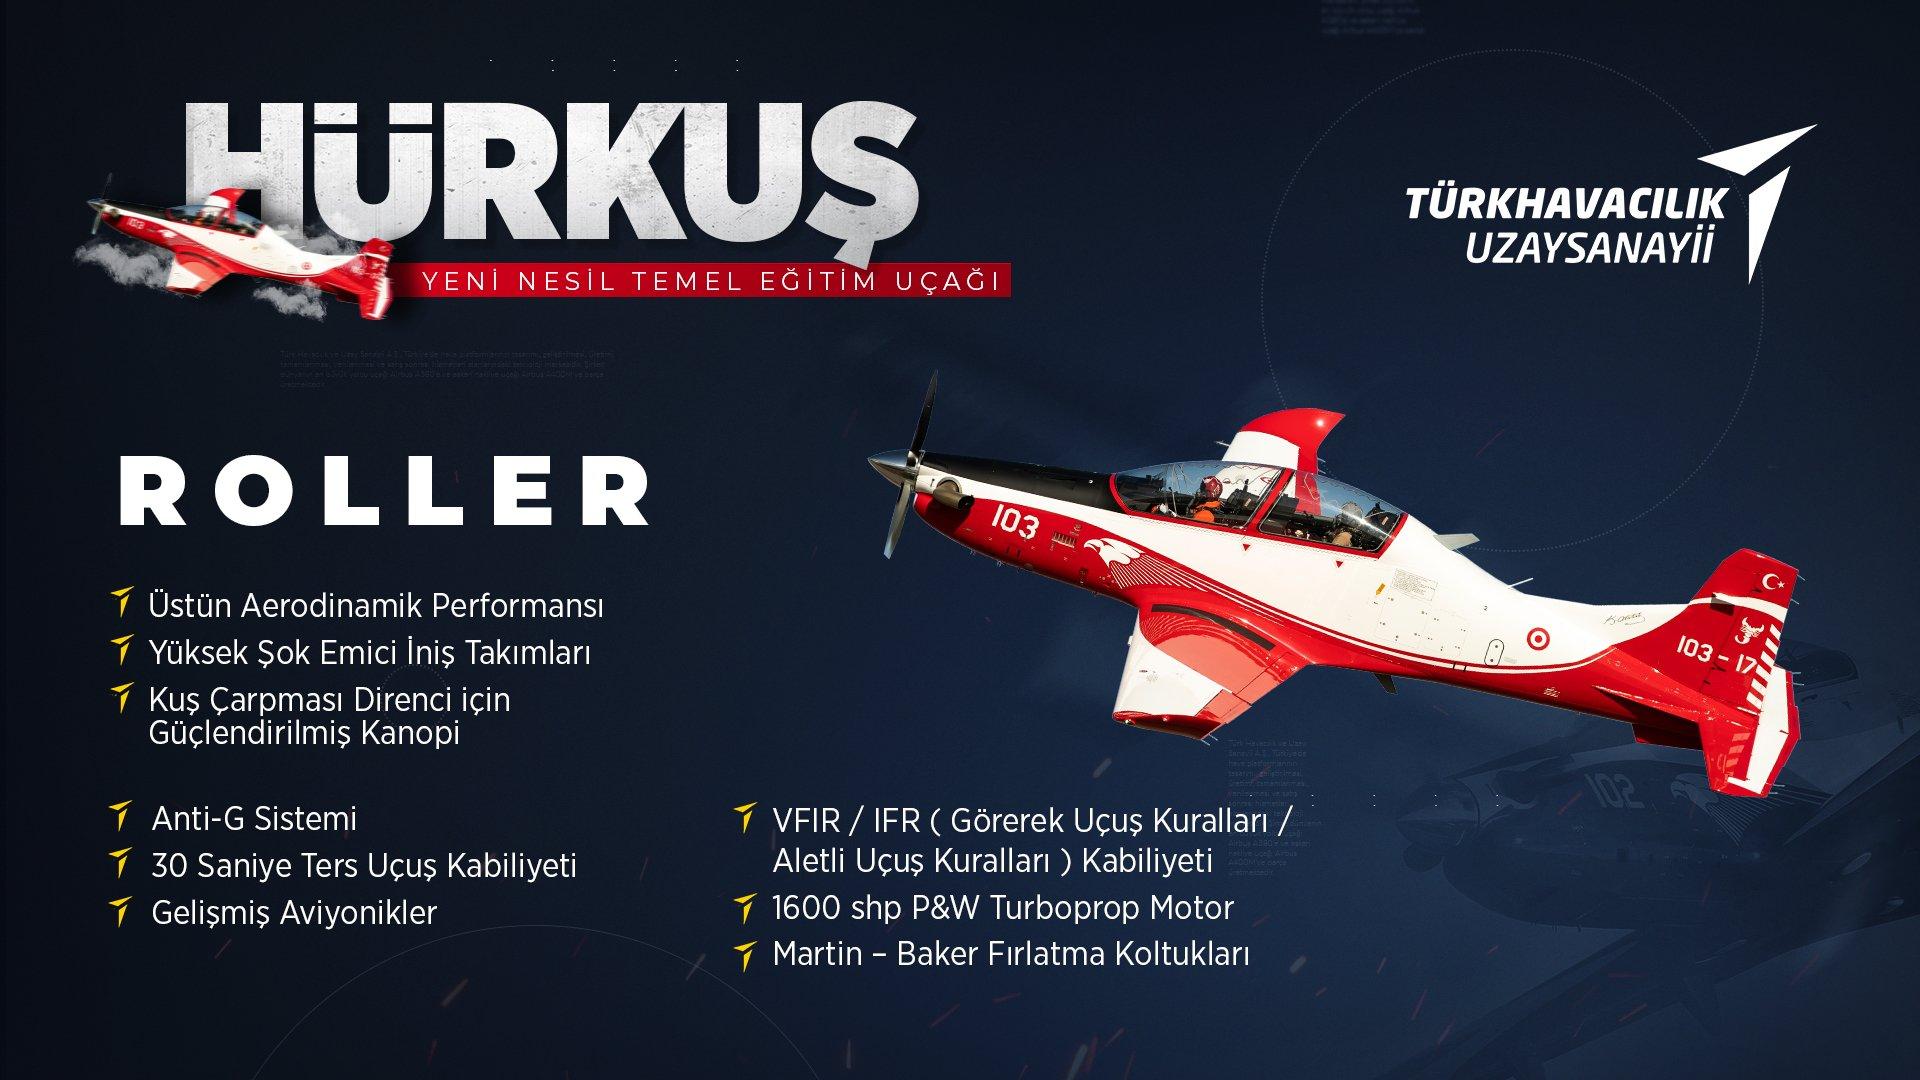 Tail Number Hurkus training aircraft